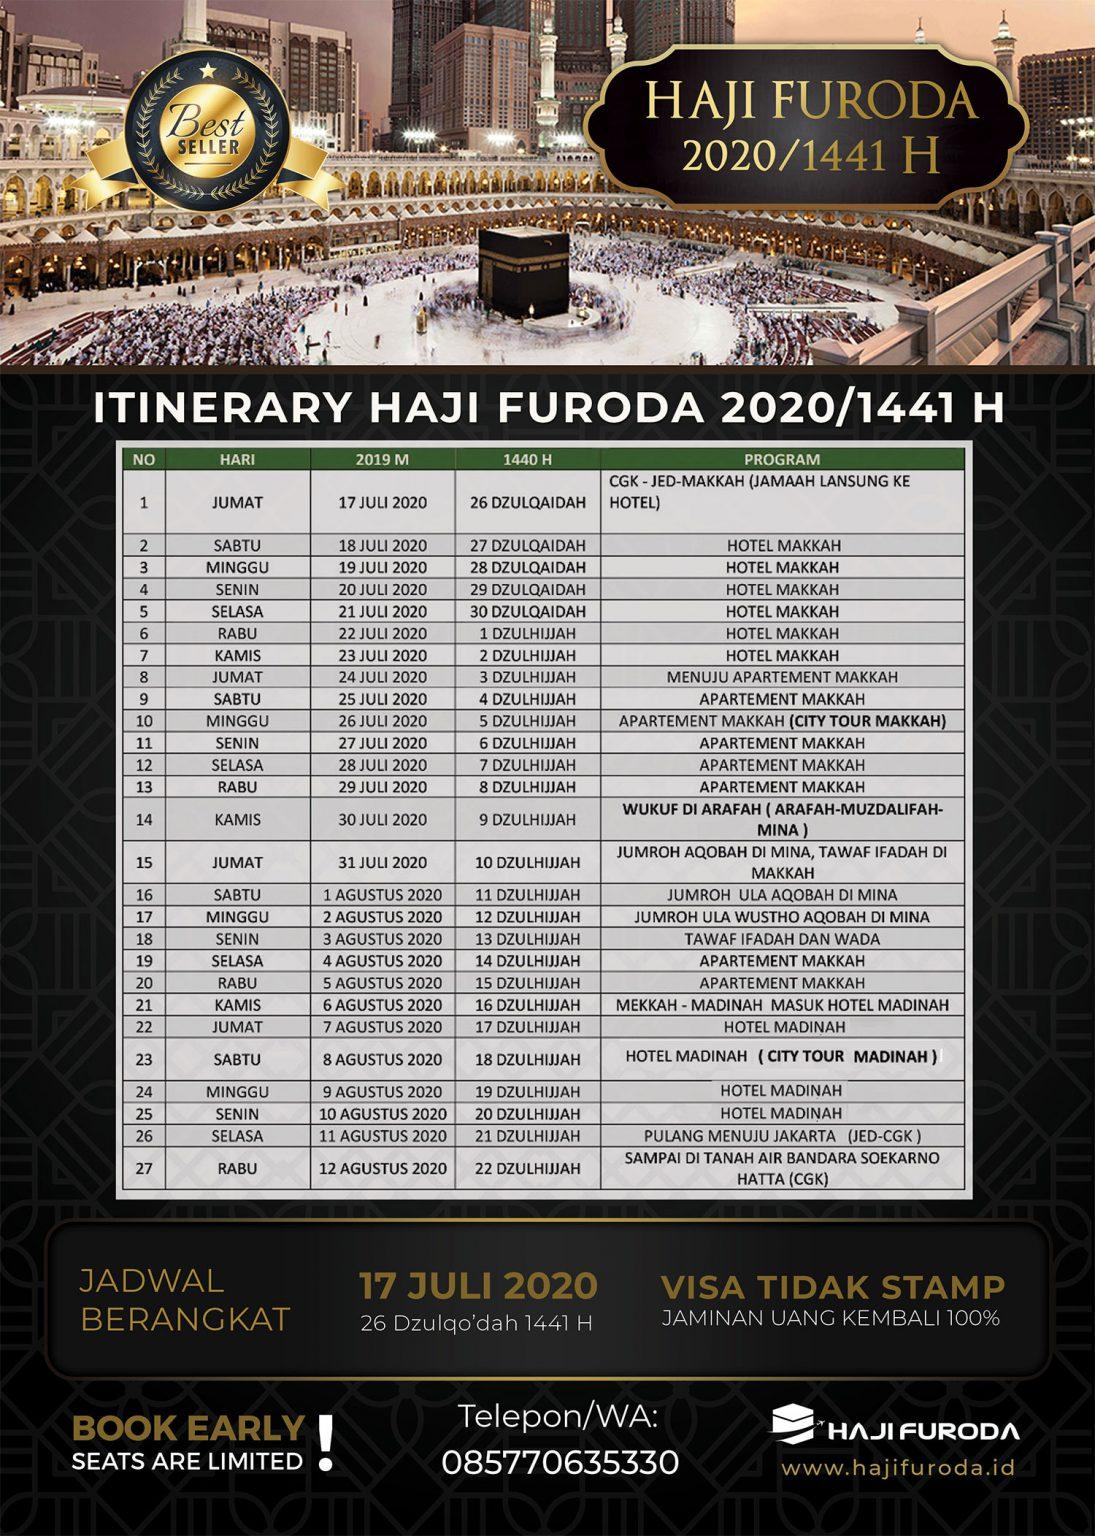 Itinerary Haji Furoda 2020